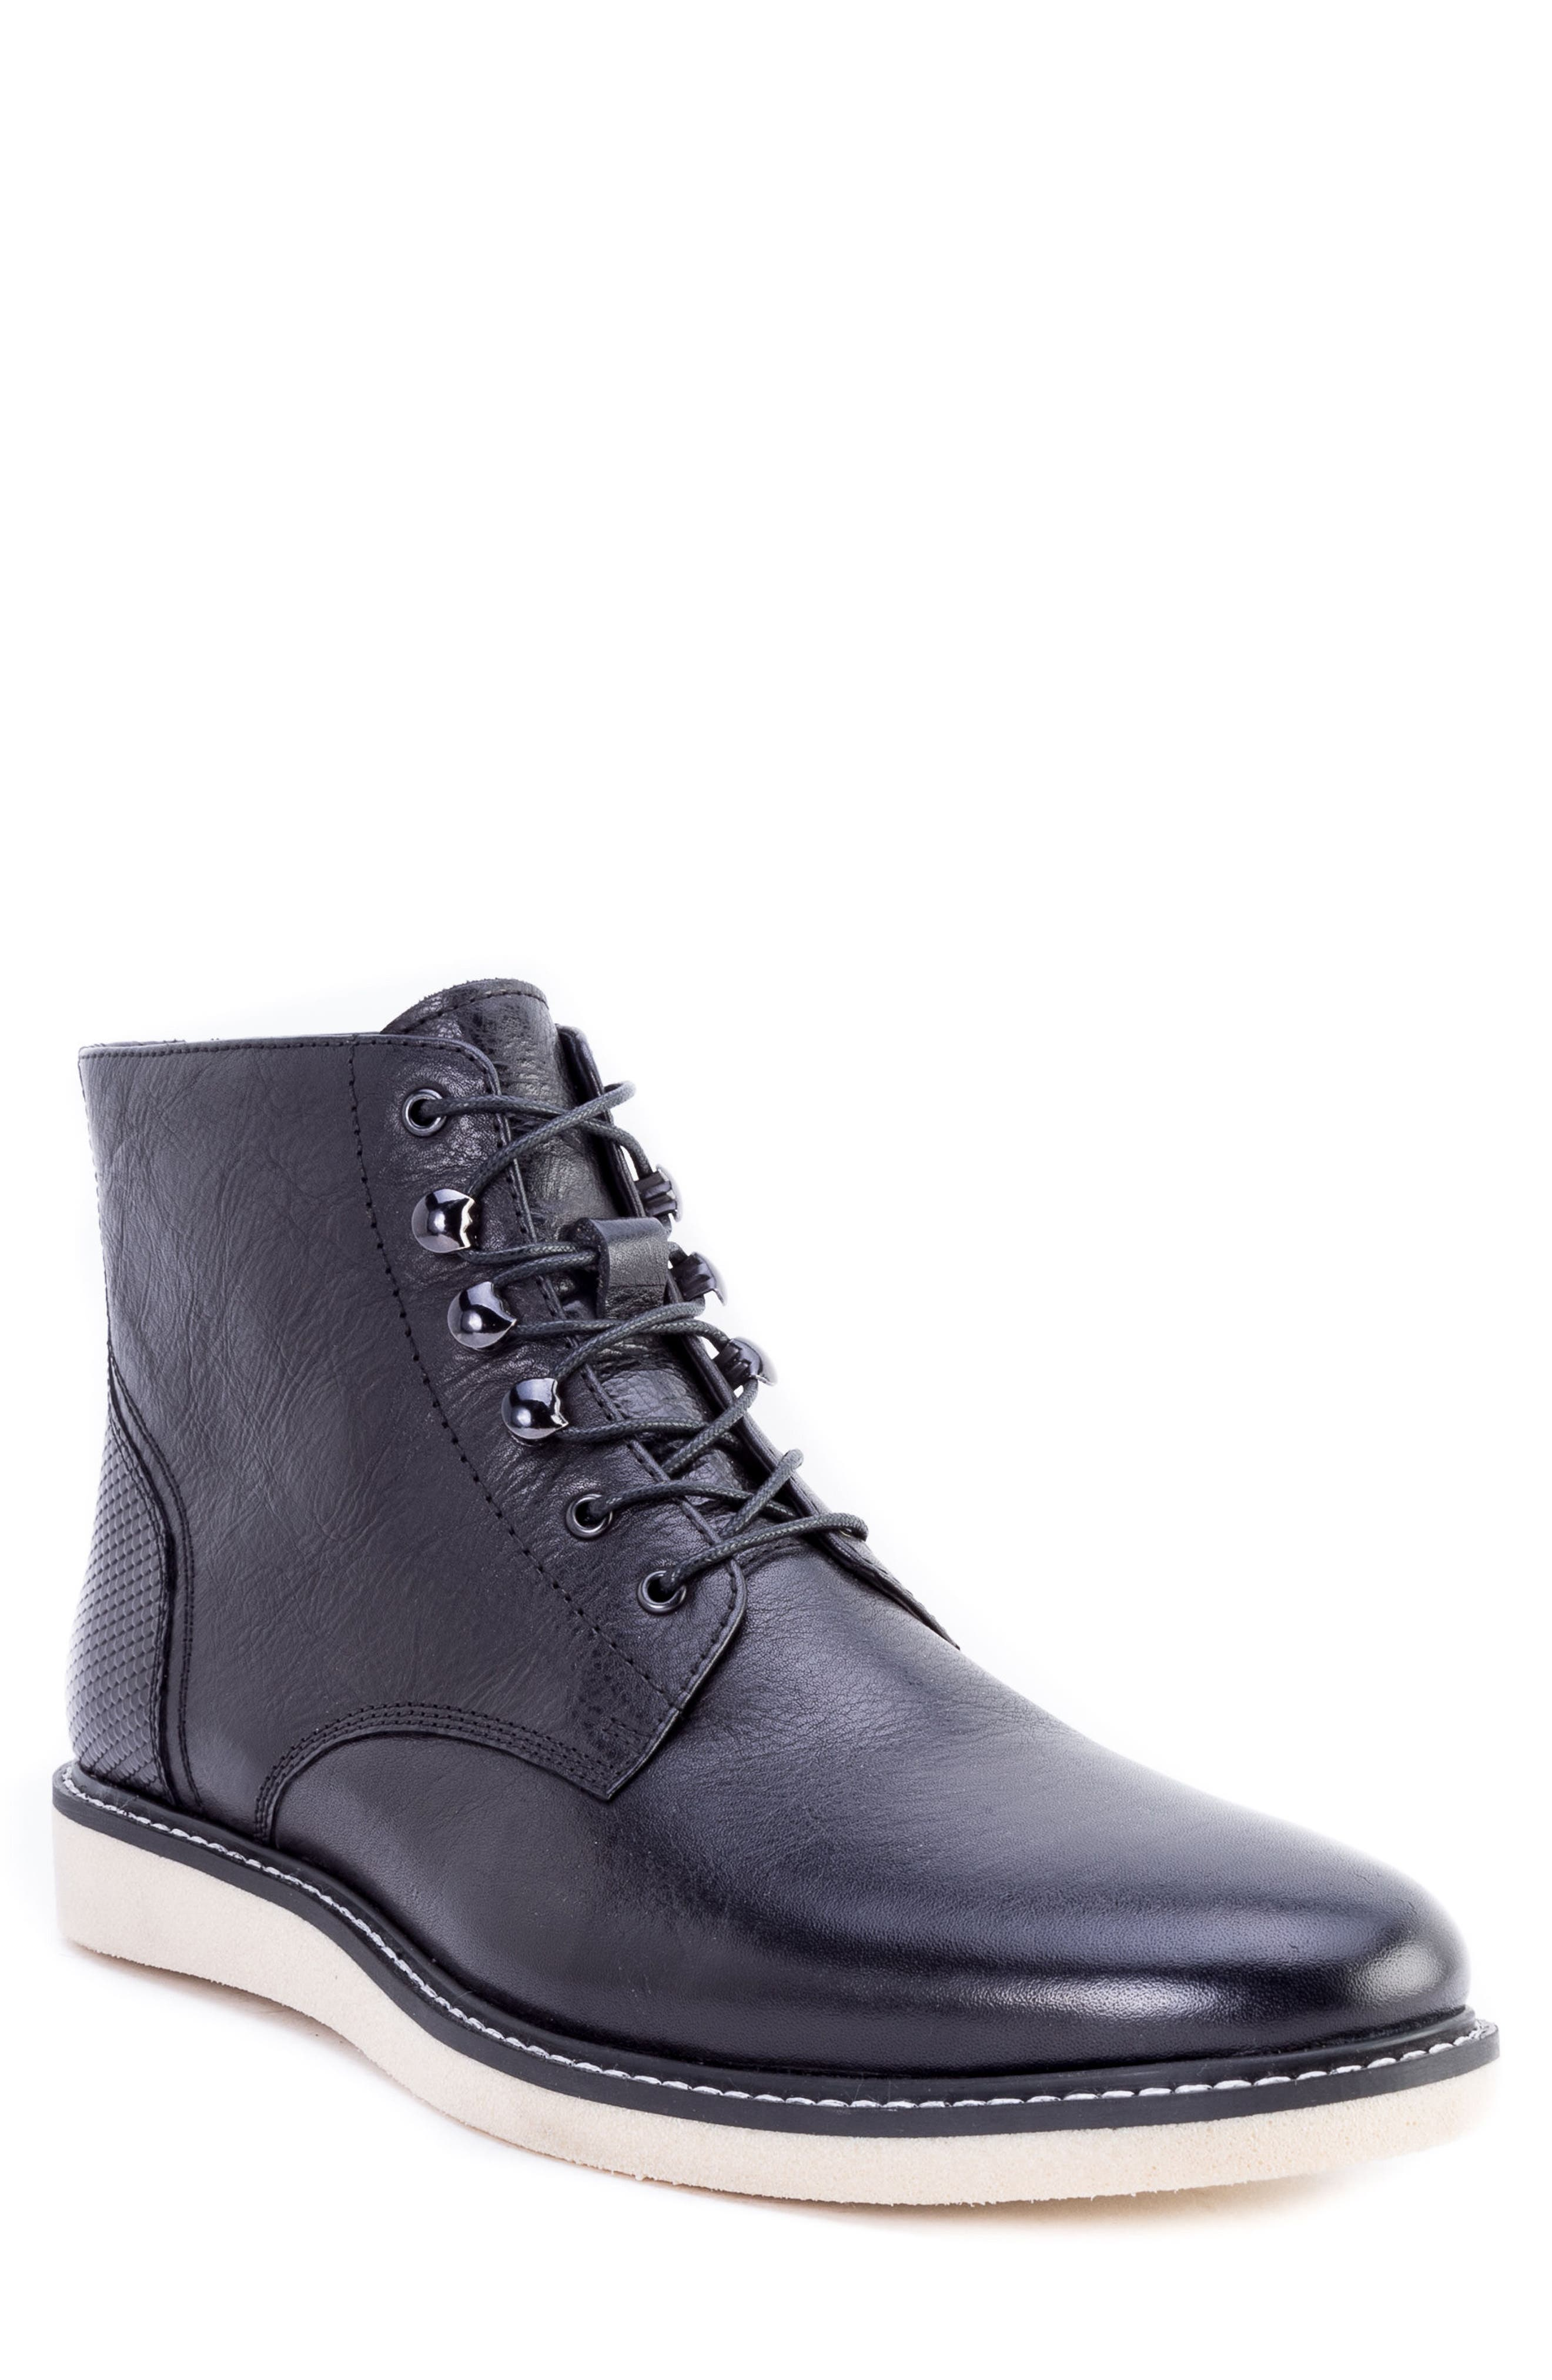 Finch Plain Toe Boot,                             Main thumbnail 1, color,                             BLACK LEATHER